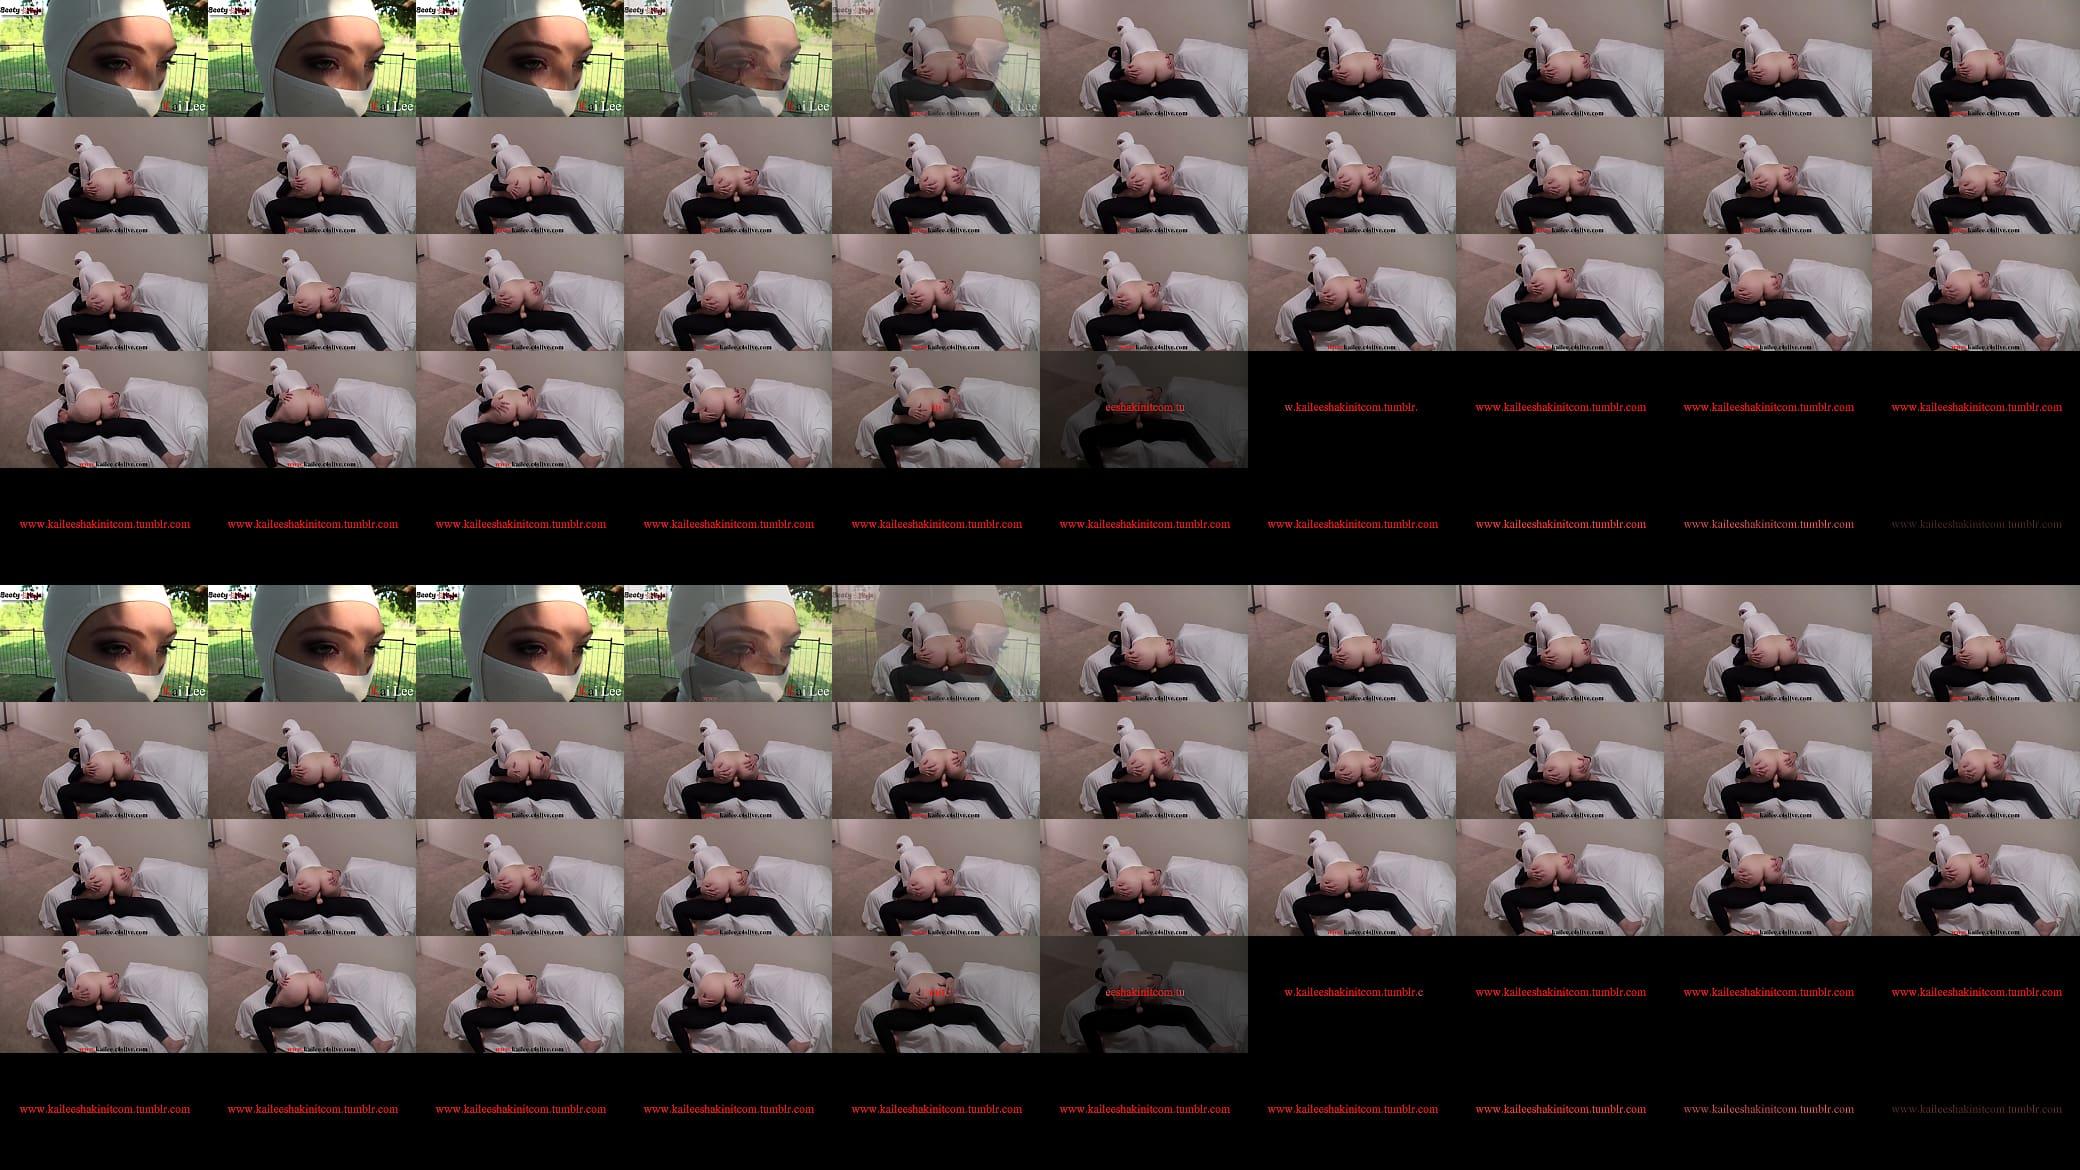 Ivy Shakinit Beautiful bootyninja bt 7-26-2011 - xvideos